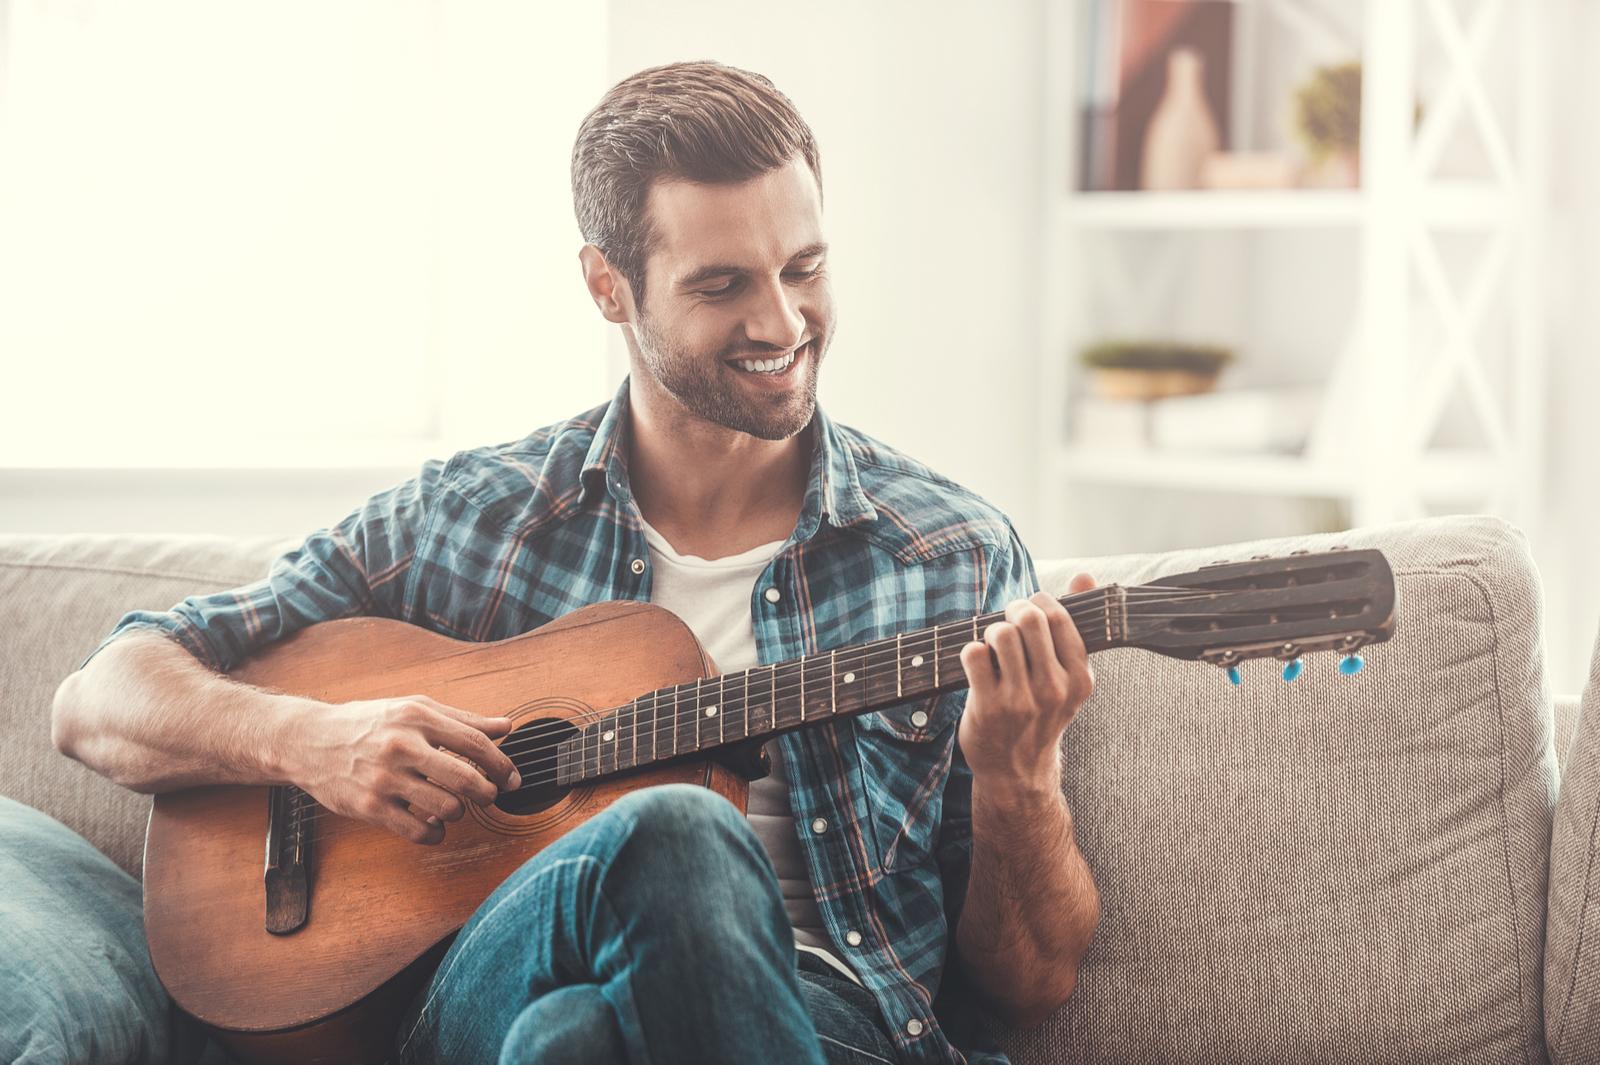 Easy Beginner Guitar Songs | 5 Easy Beginner Guitar Songs That Will Make You A Rockstar